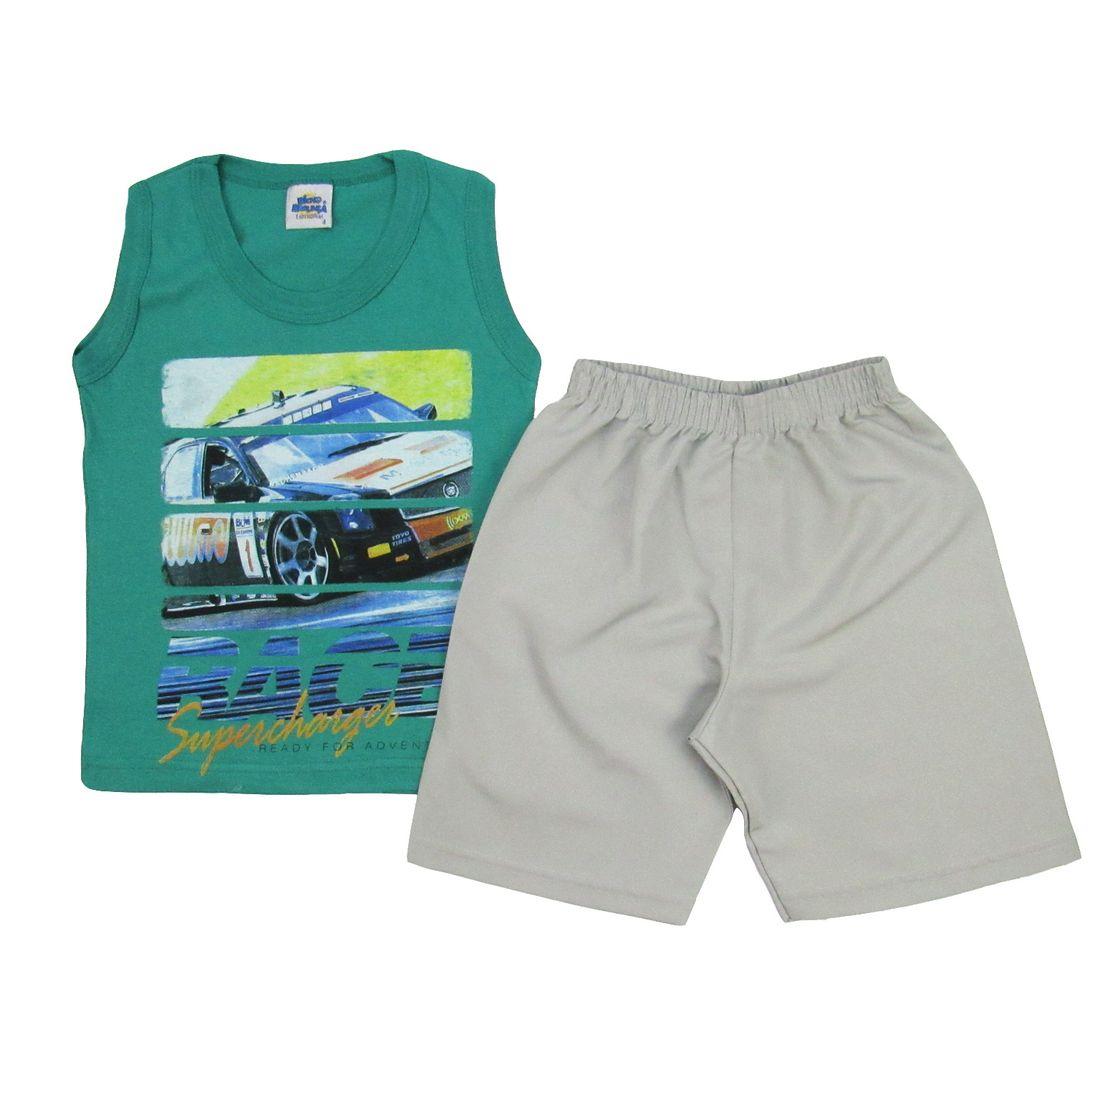 Conjunto Masculino Infantil Regata Verde e Bermuda Cinza - poetique deb21aca202